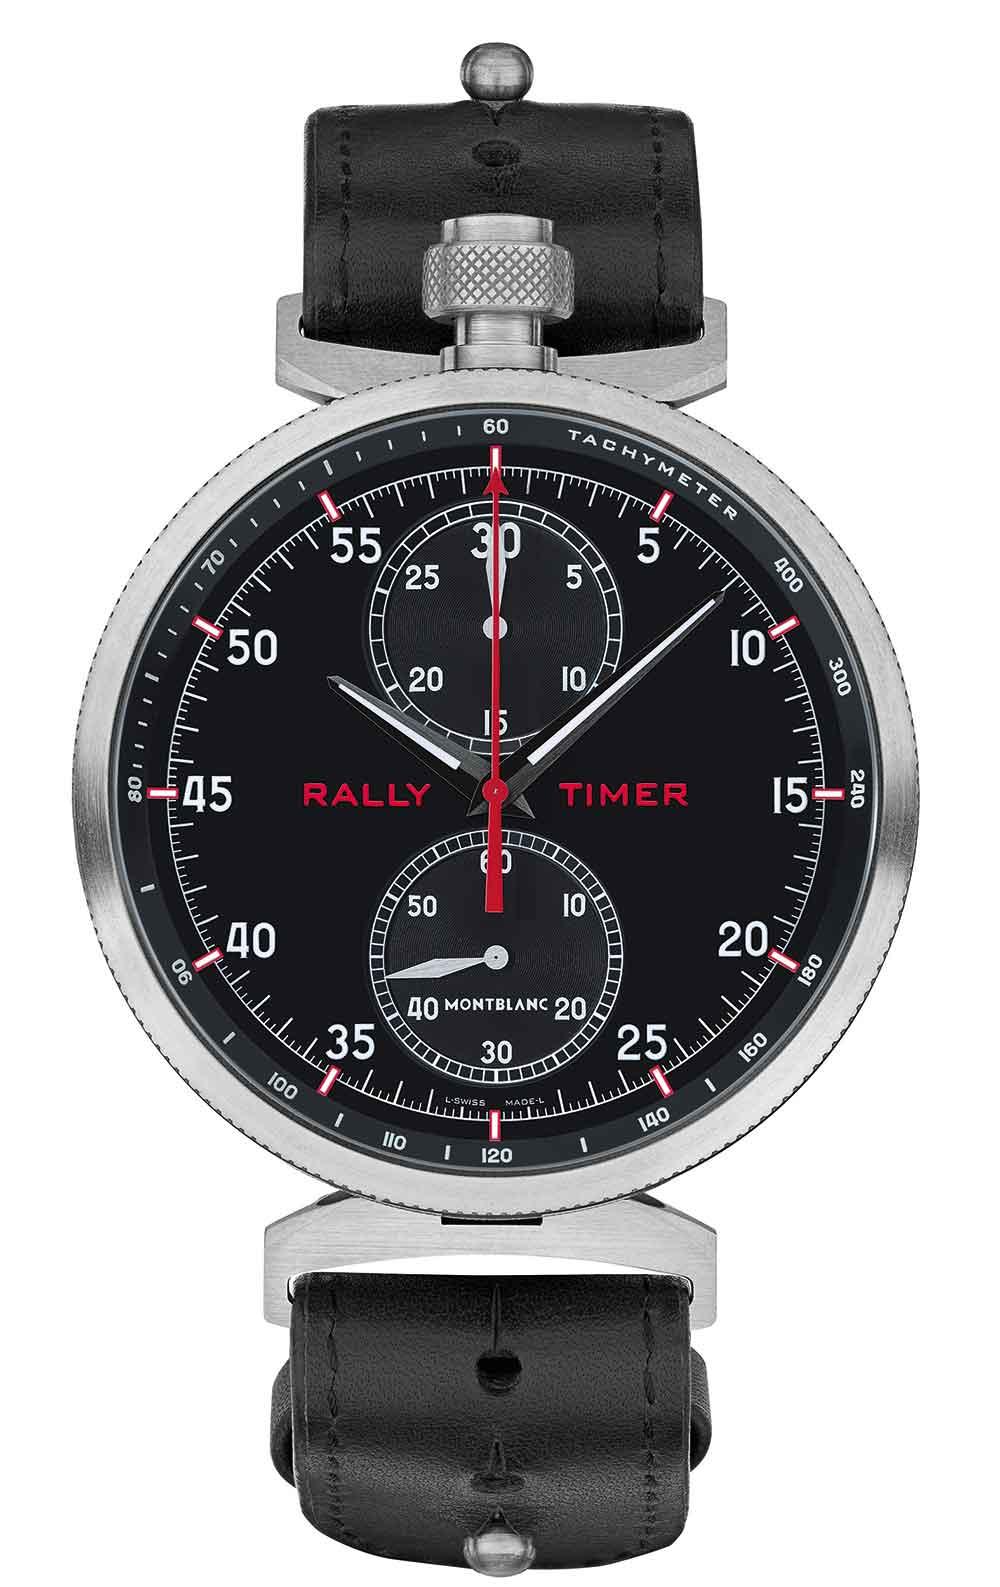 Montblanc TimeWalker Rally Timer